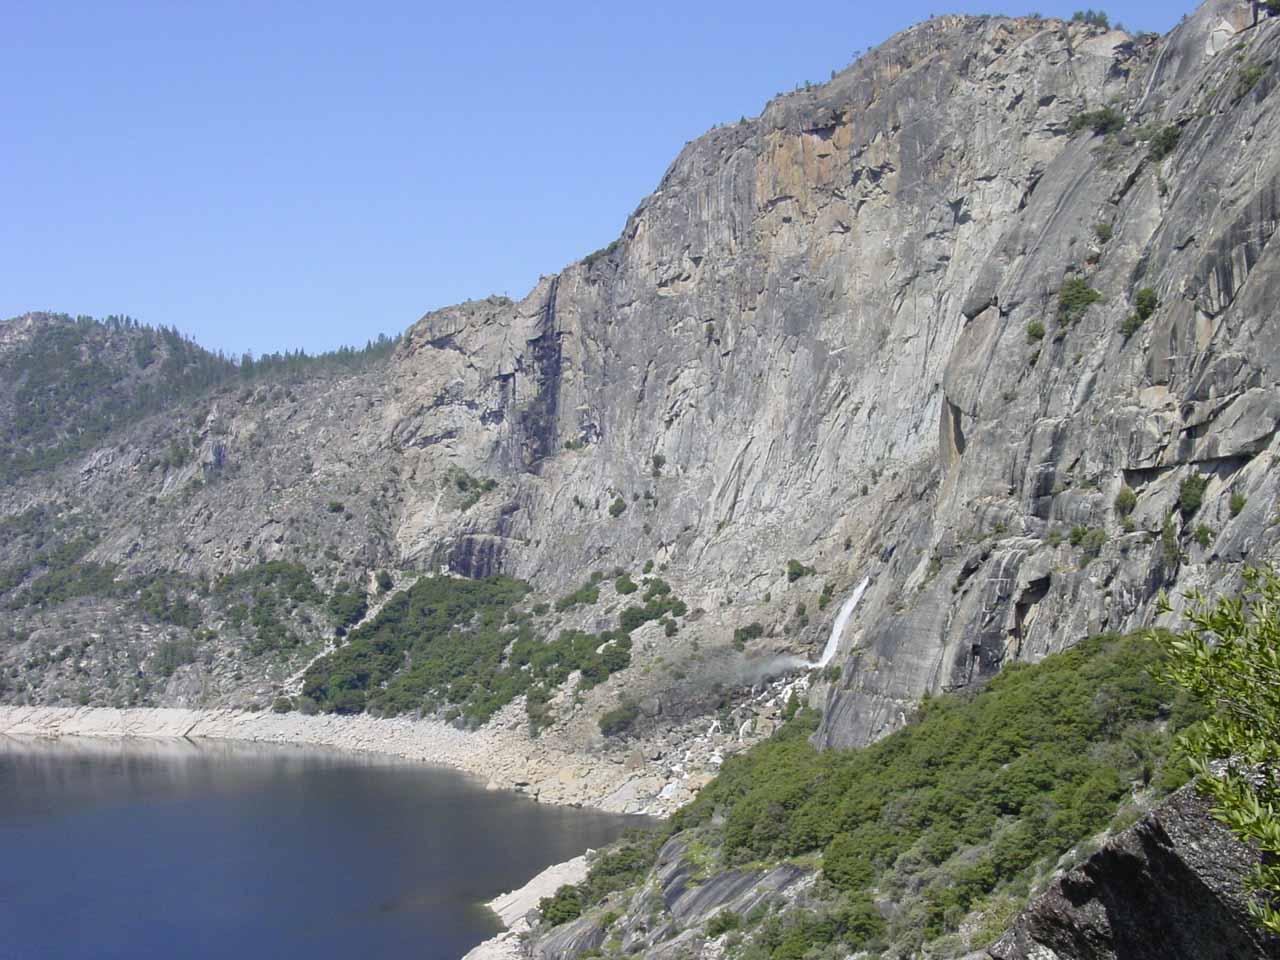 Looking back towards both Tueeulala and Wapama Falls